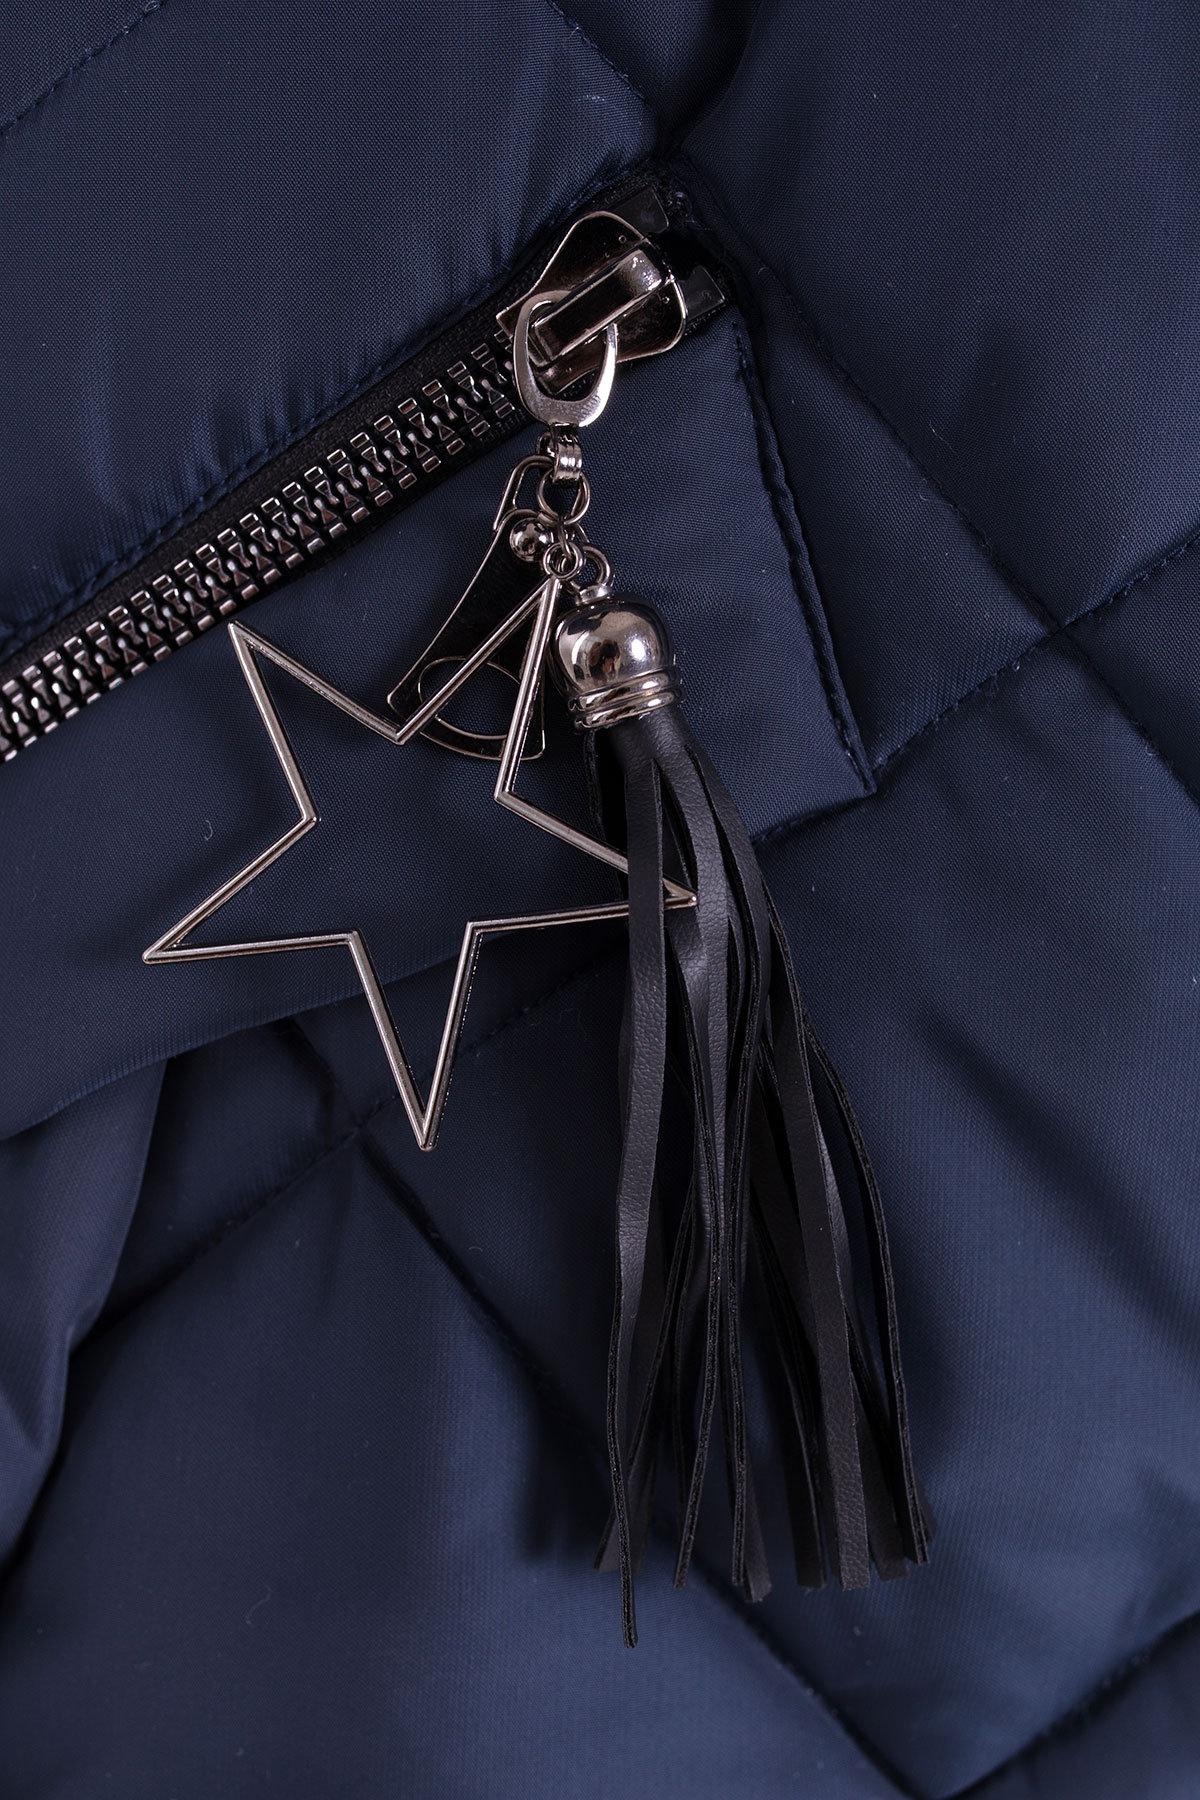 Куртка на зиму со стежкой ромбами Лисбет 3253 Цвет: Темно-синий